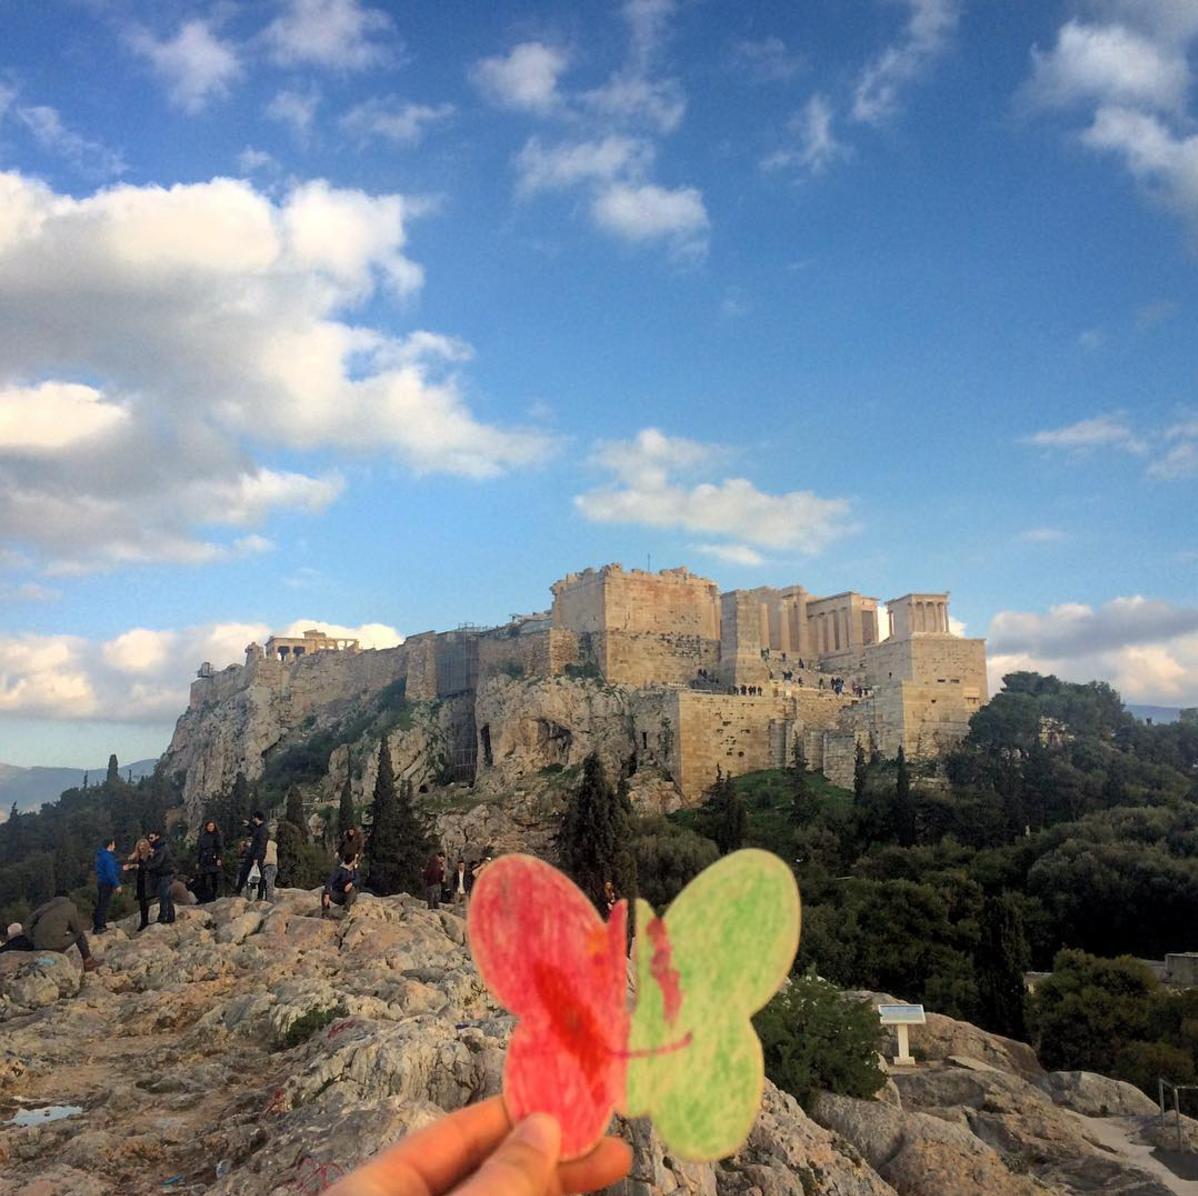 Butterwormie visits the Acropolis